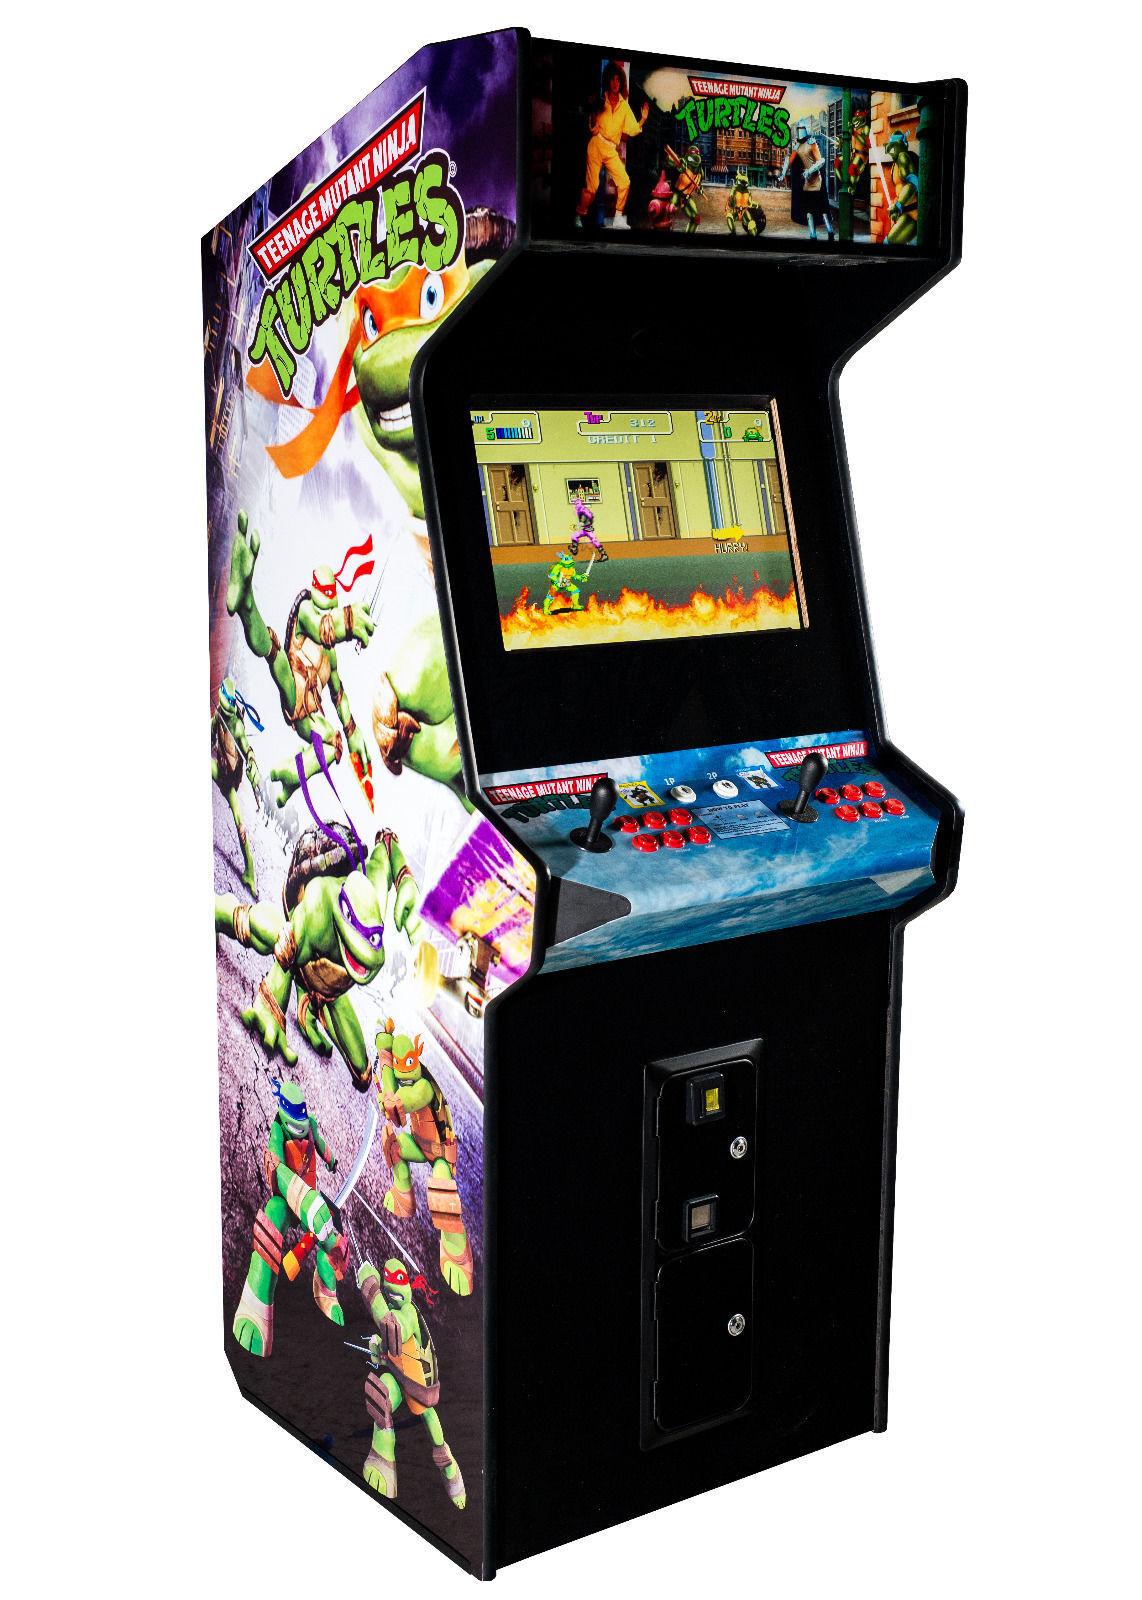 Ninja Turtles Arcade Cabinet The Top 10 Arcade Games Ebay